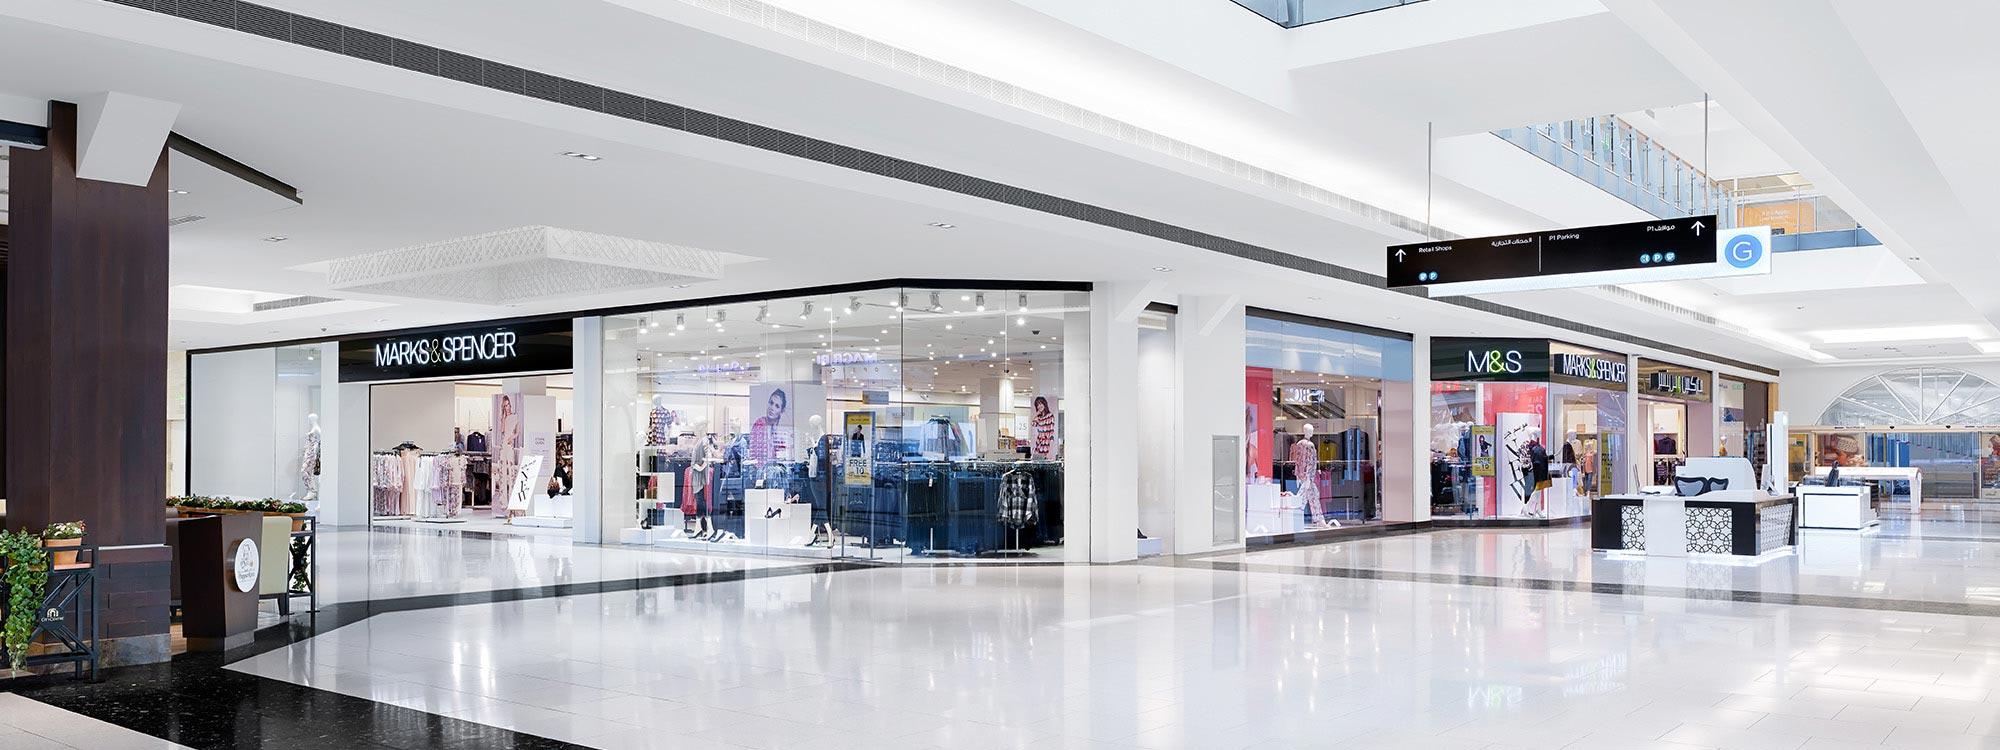 Shopping, Restaurants, Vox Cinema | City Center Muscat